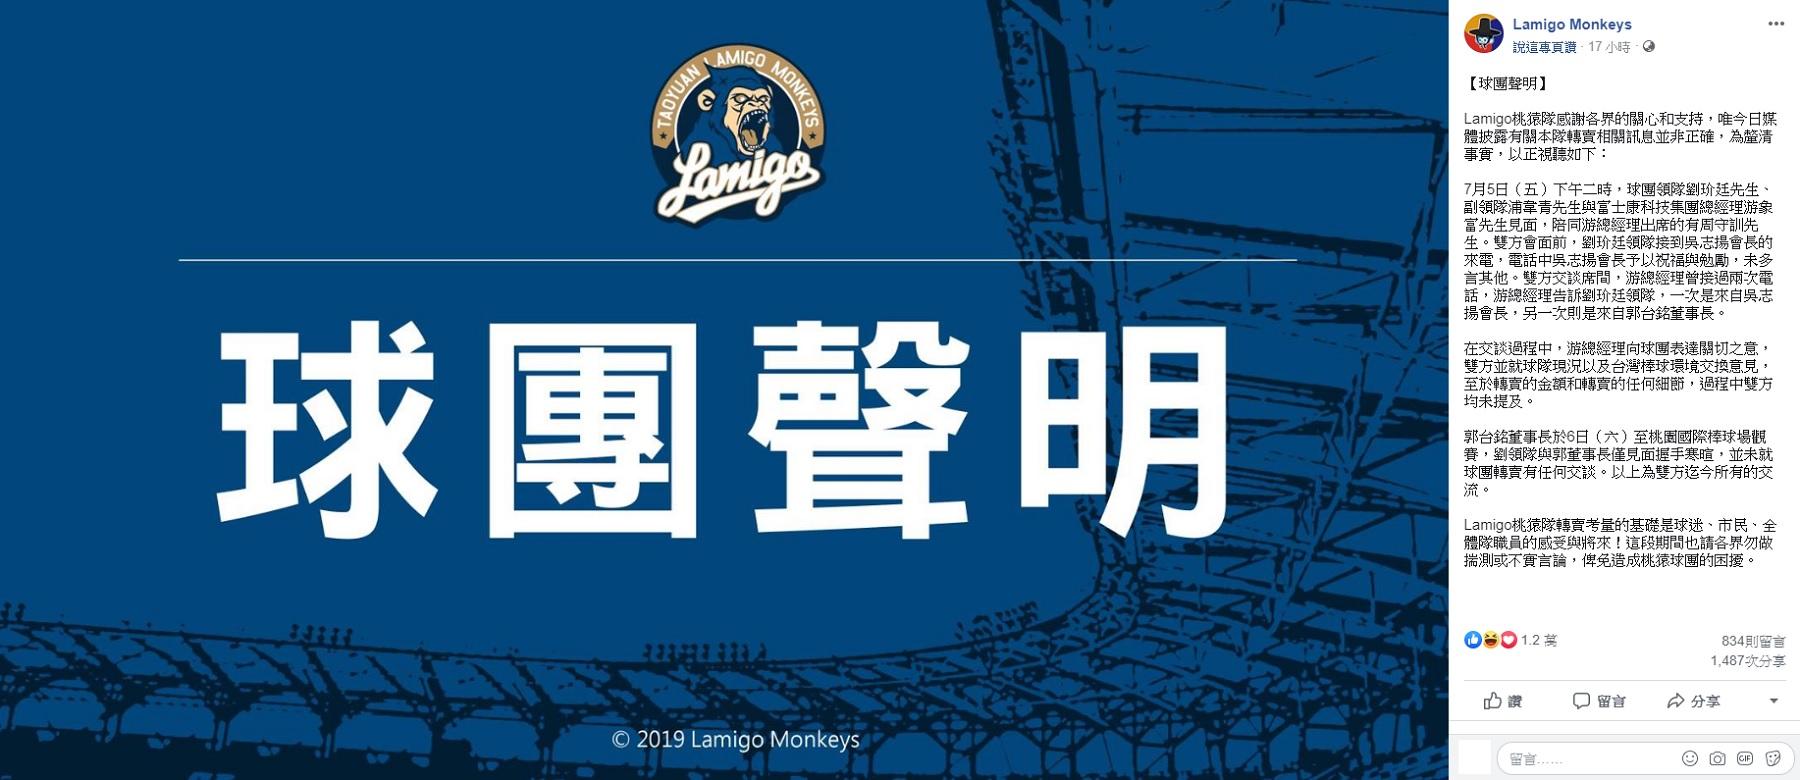 Lamigo球團發布聲明澄清轉賣交易破局相關細節。圖/Lamigo Monkeys臉書